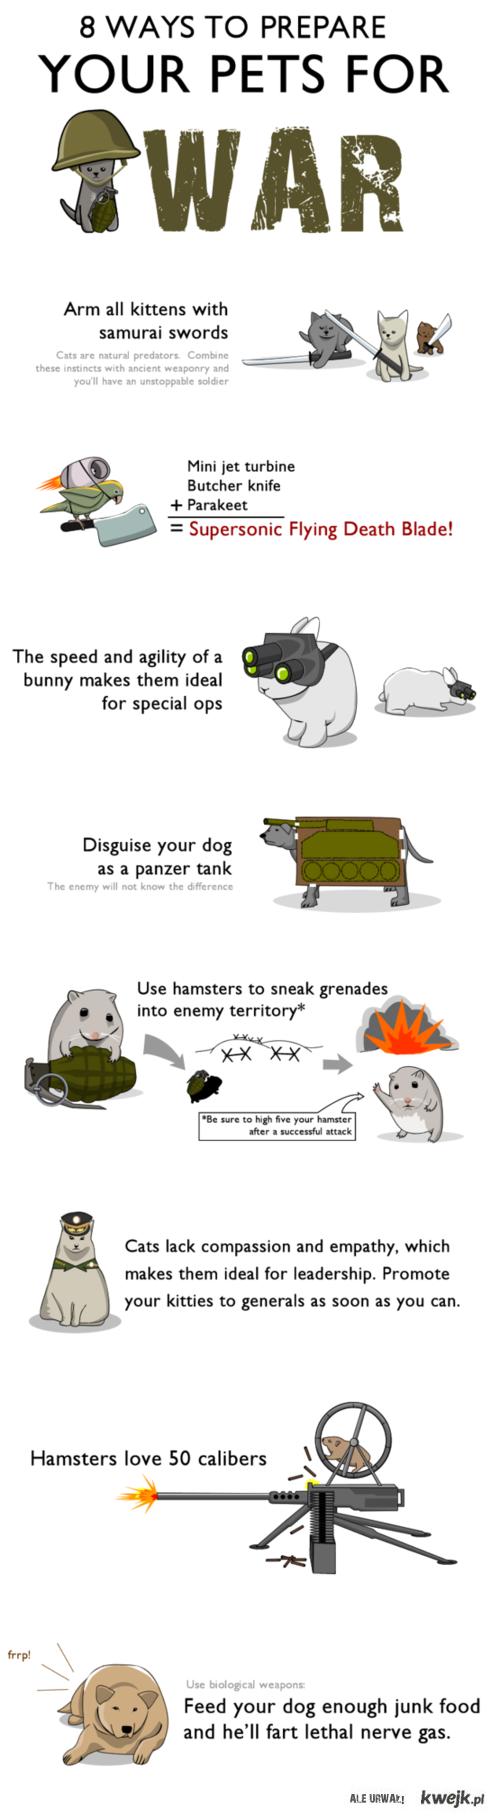 prepare your pets